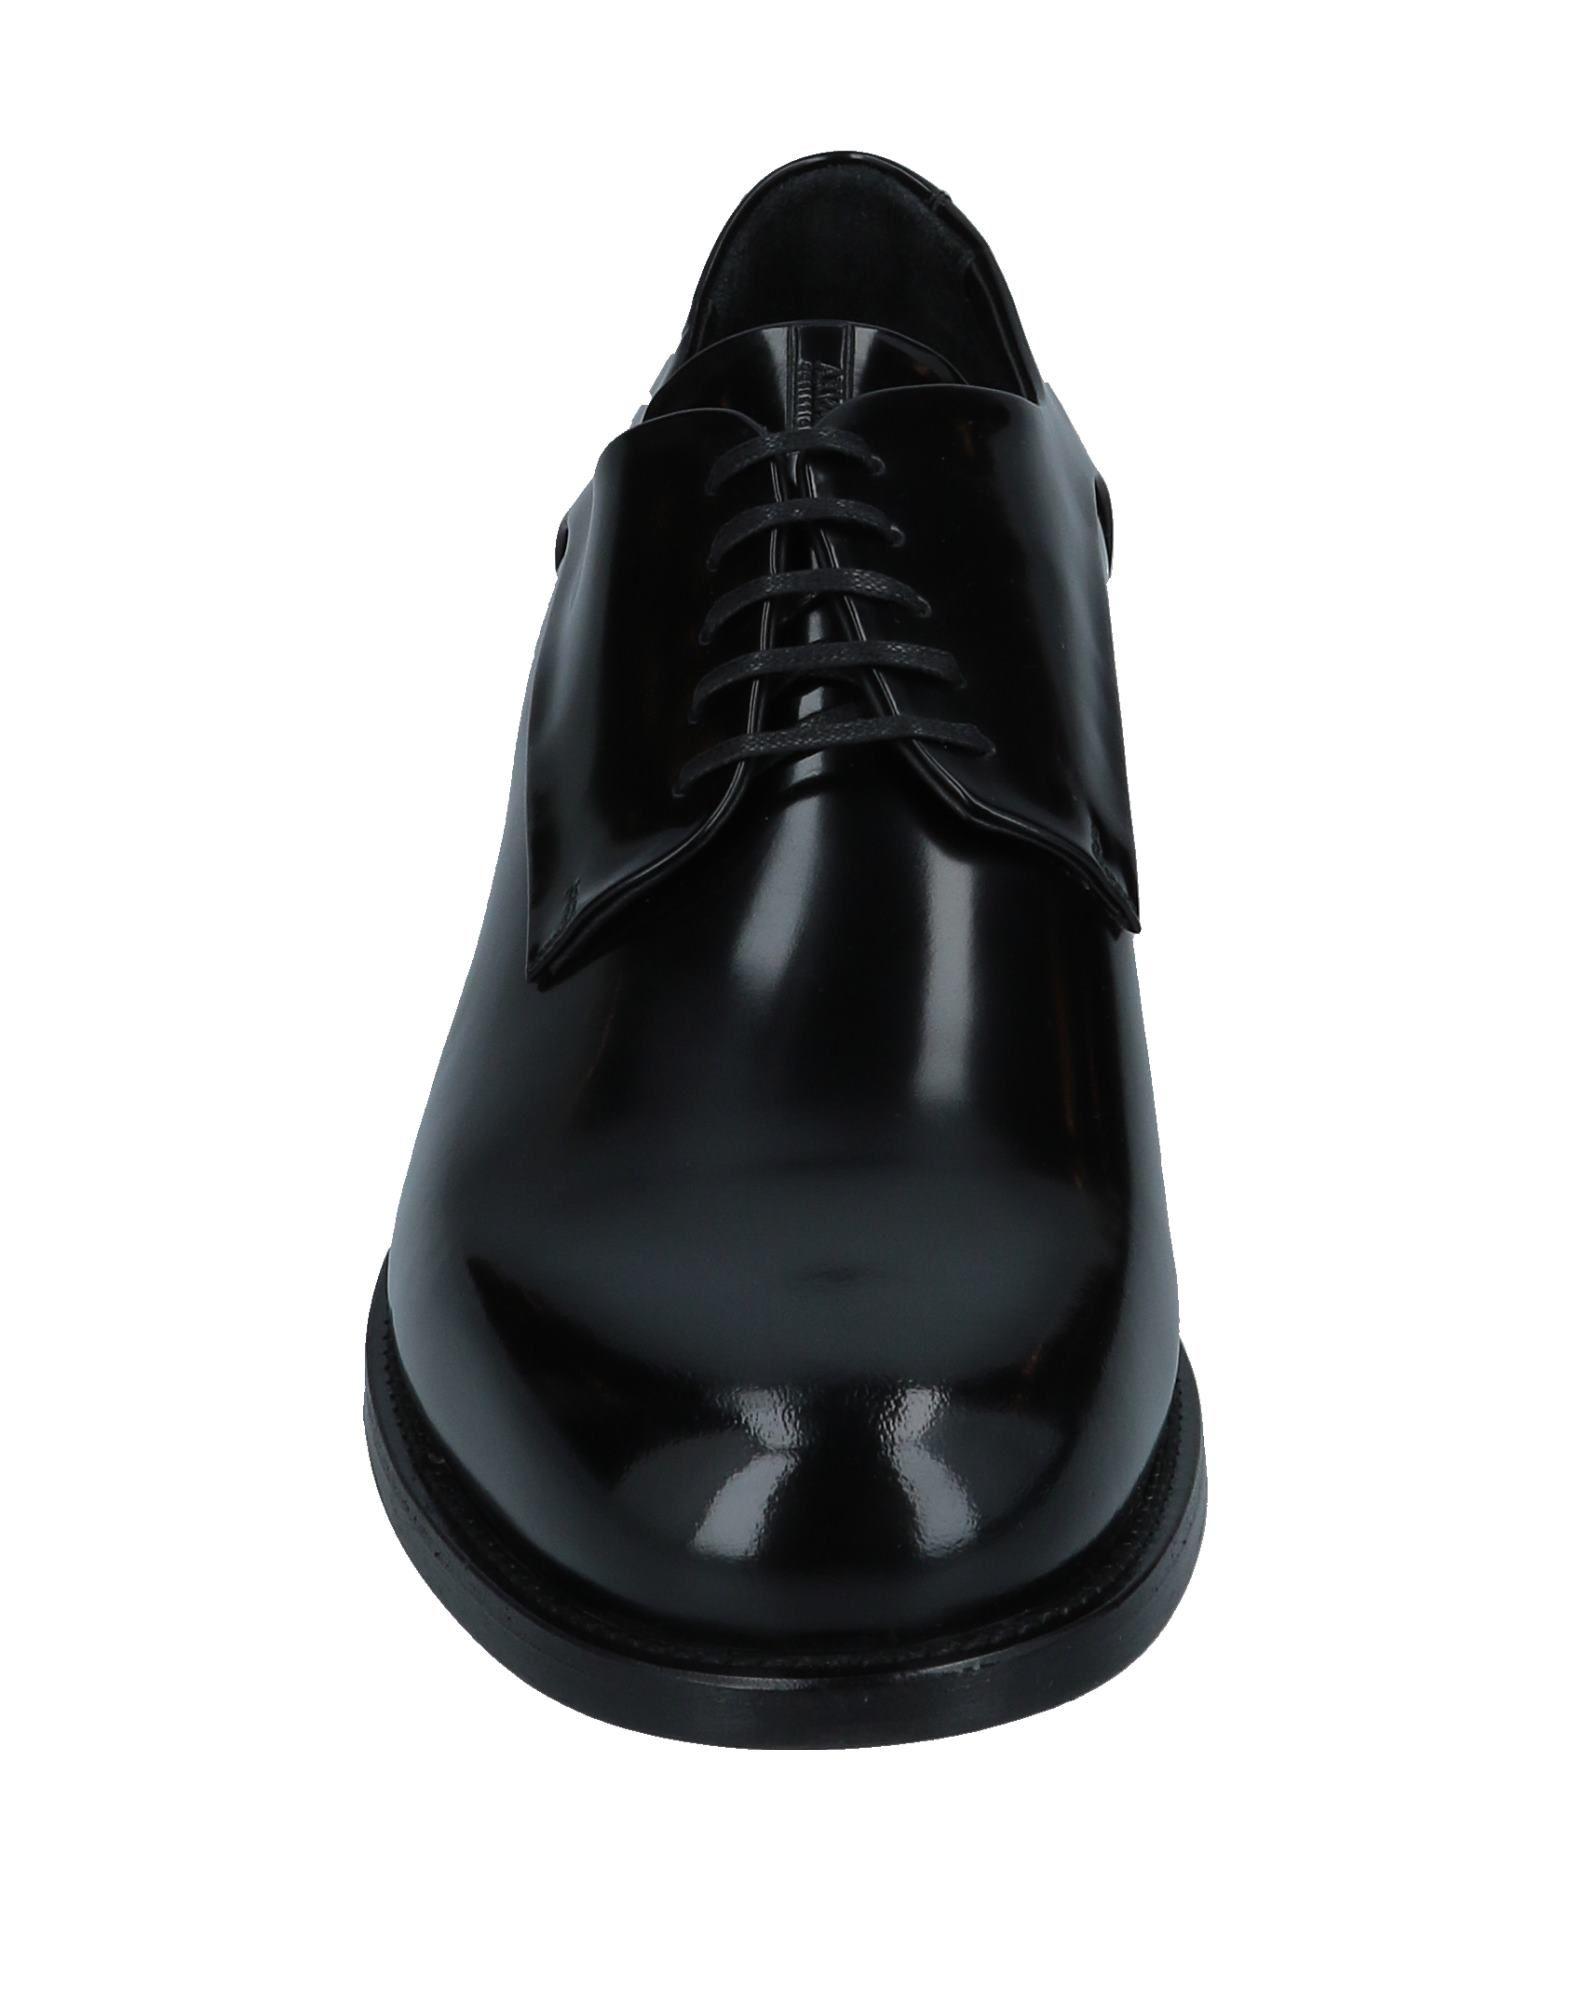 Armani Collezioni Gute Schnürschuhe Herren  11553775WW Gute Collezioni Qualität beliebte Schuhe aa77d5